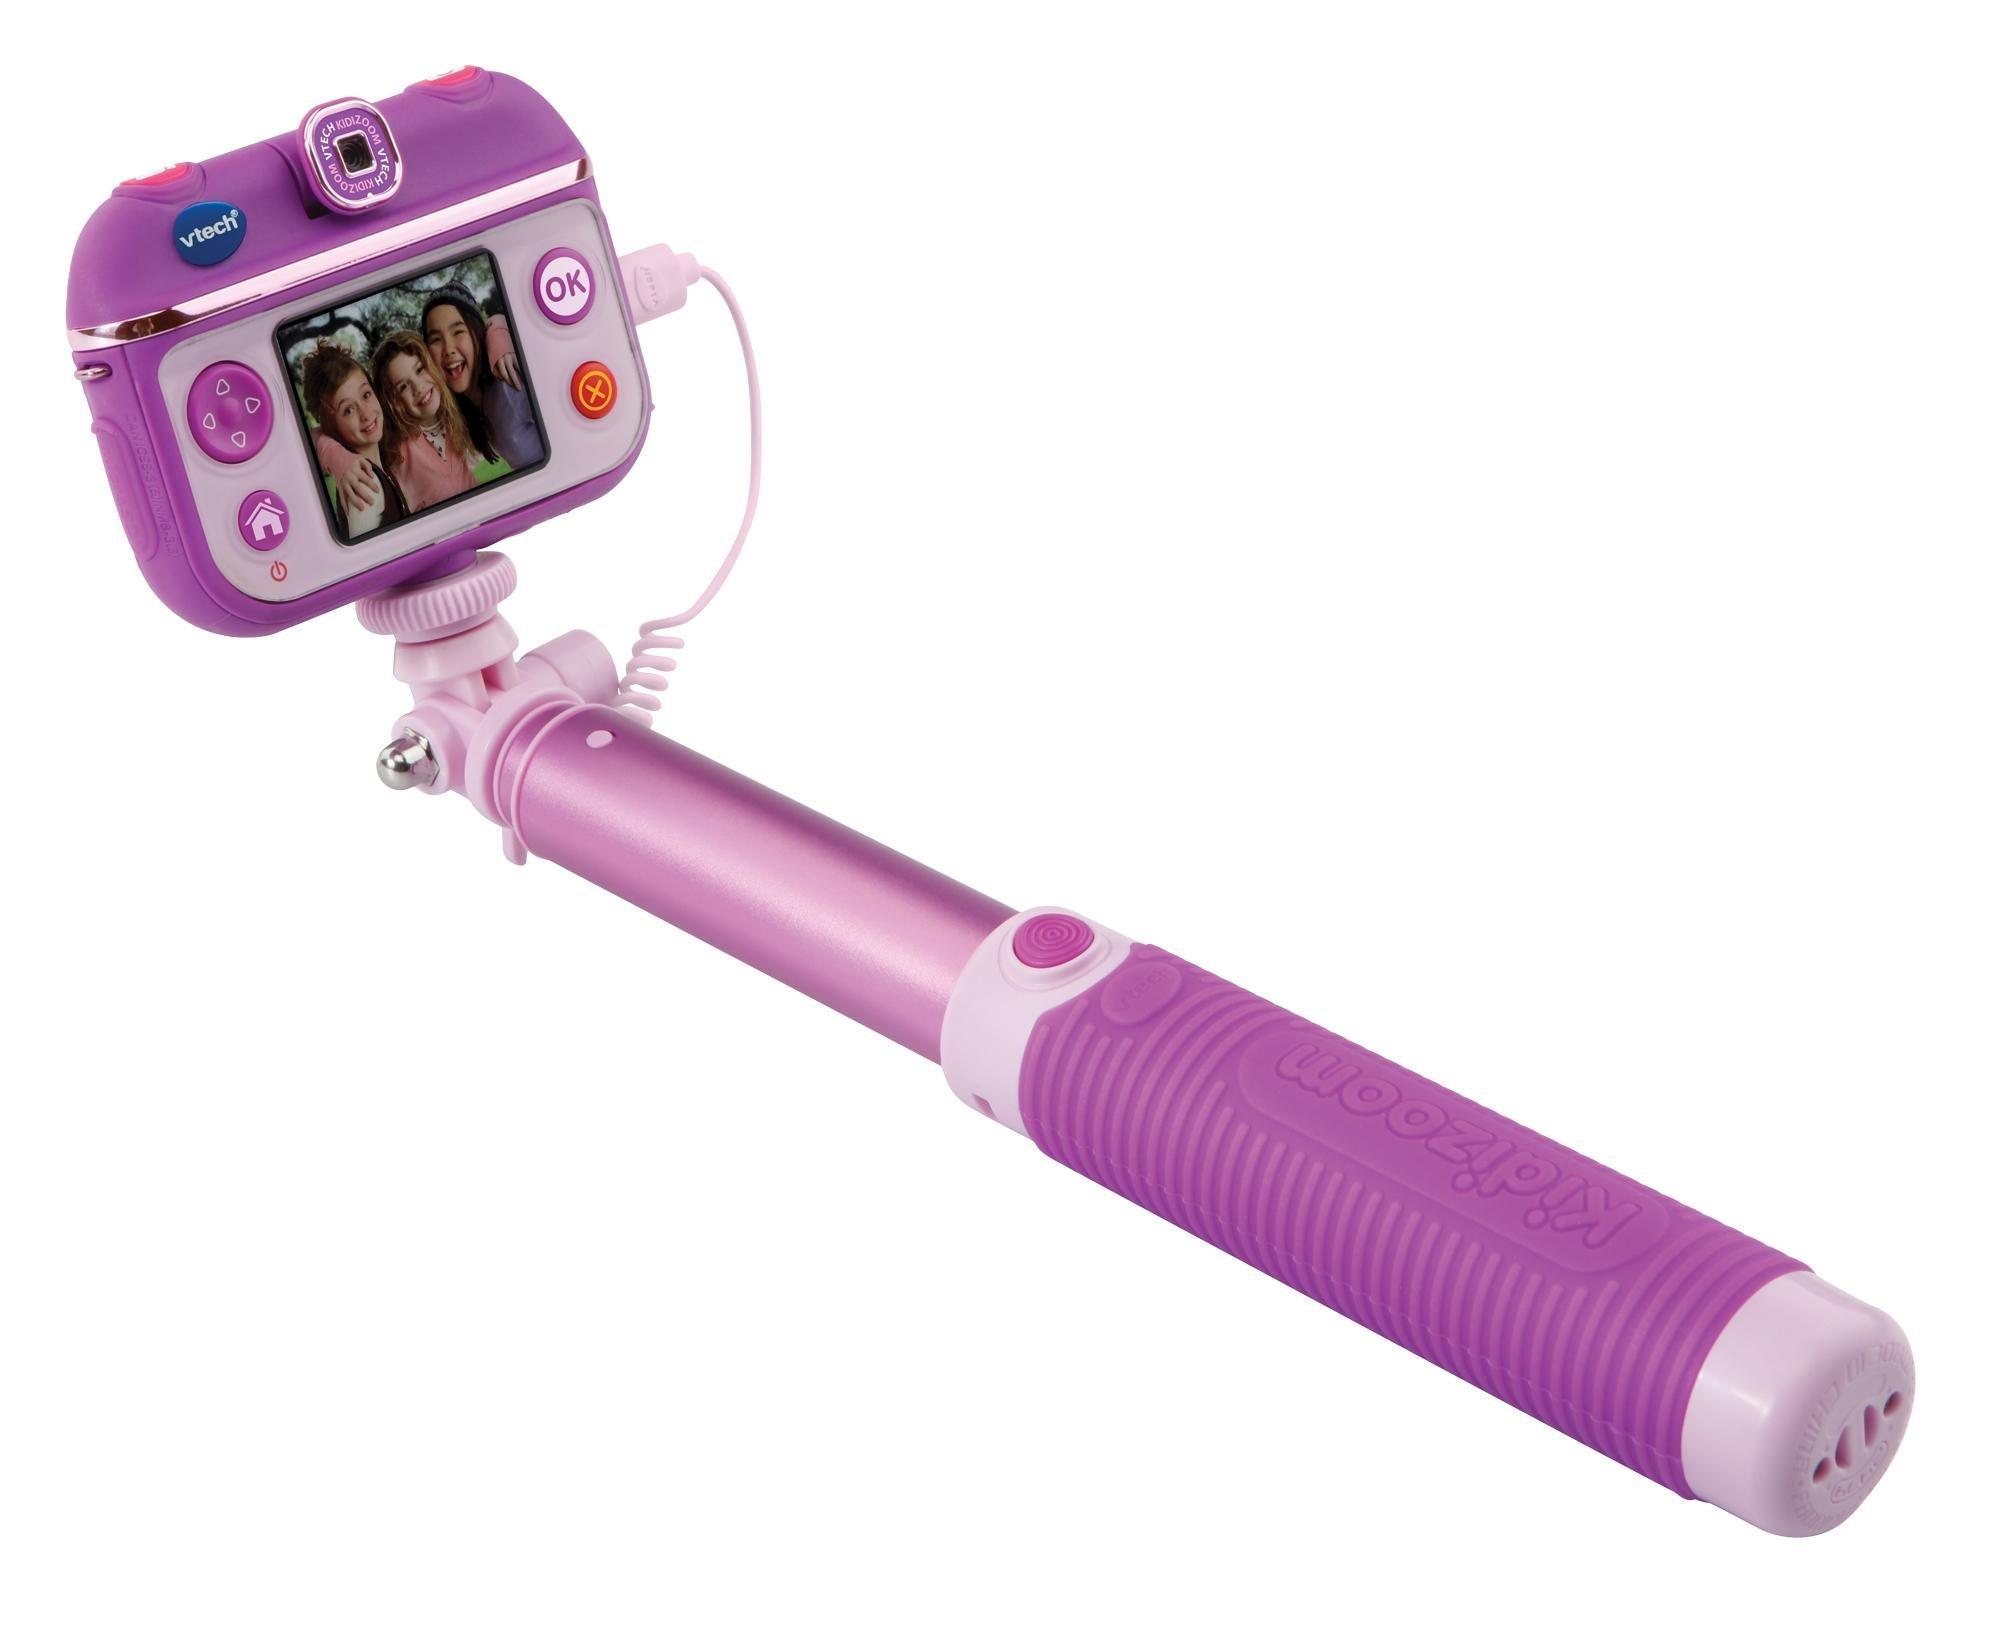 VTech Toys Half Price at Tesco Direct - From £3.50 eg VTech Kidizoom Selfie Cam was £50 now £25